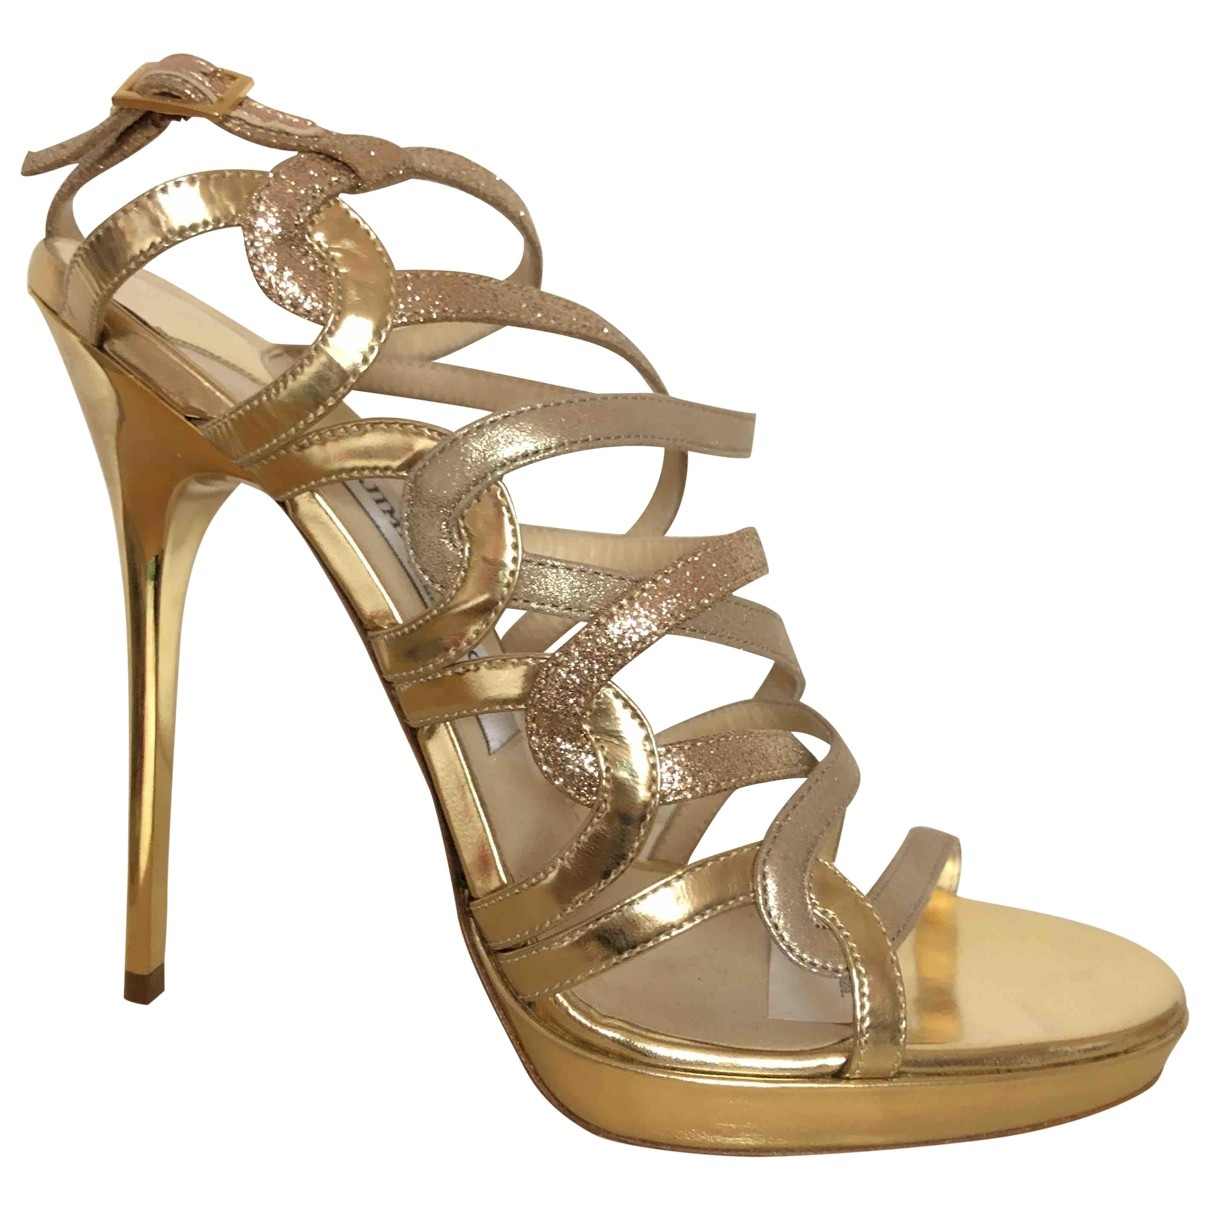 Jimmy Choo \N Gold Leather Sandals for Women 39 EU